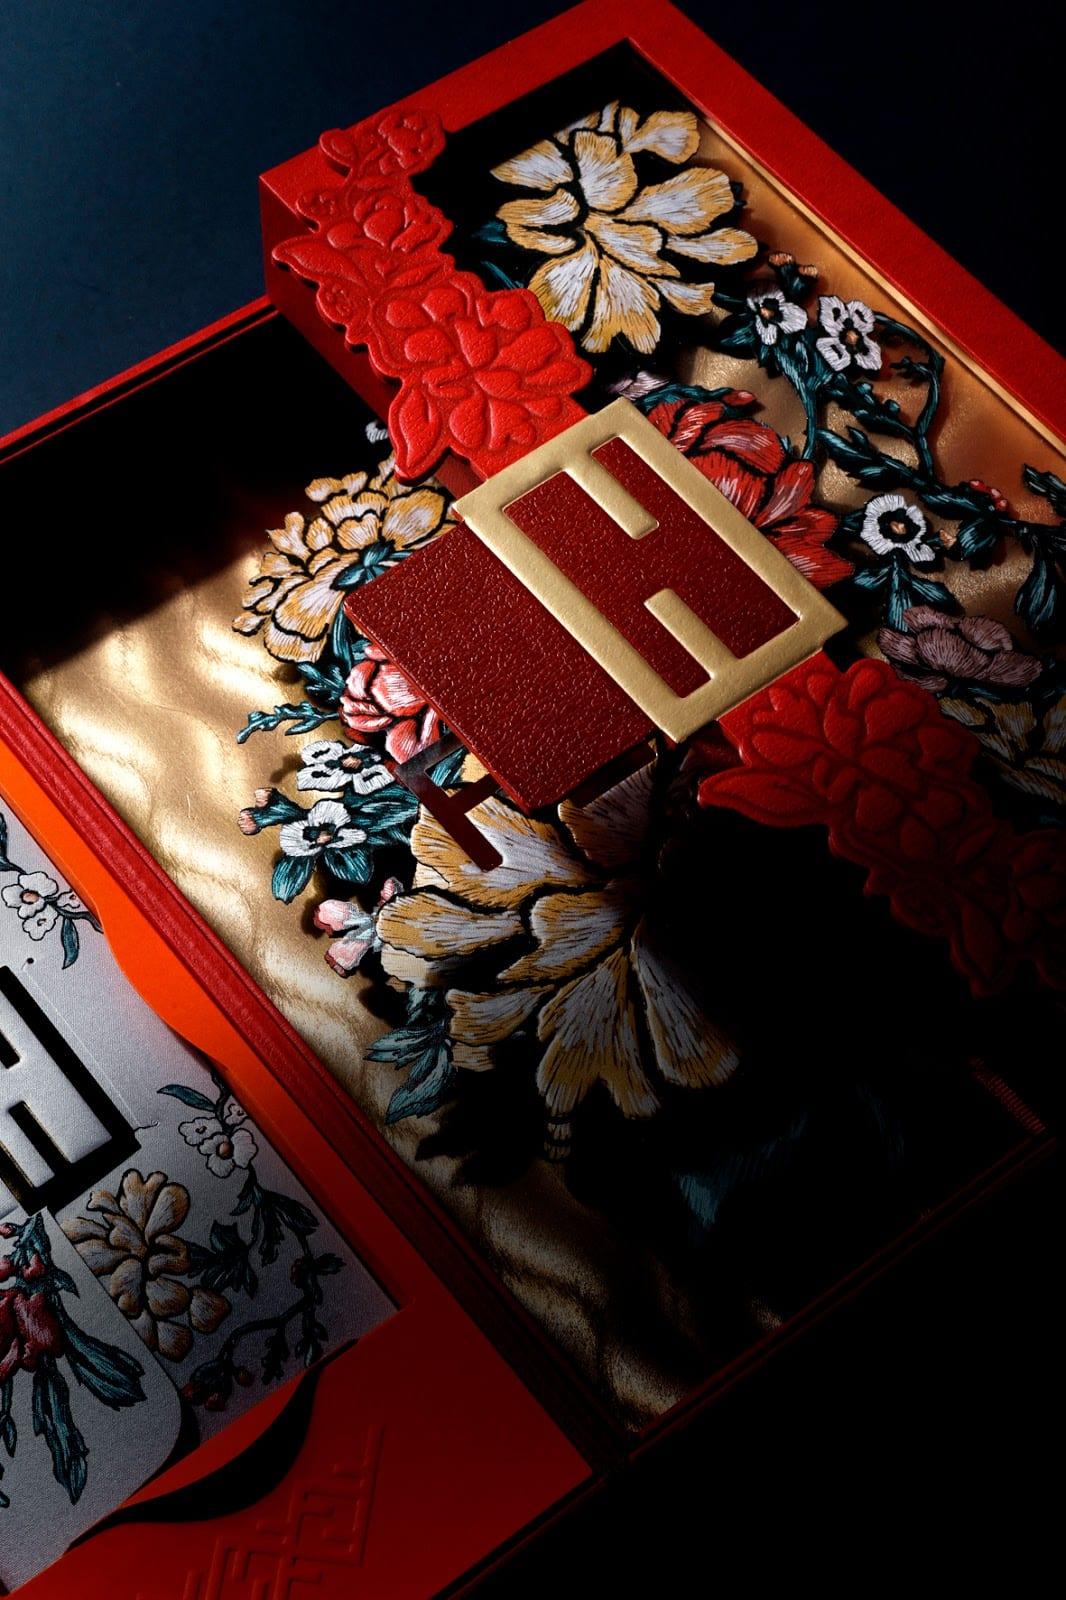 fendi cny delux 04 - Fendi Red Packet 2019